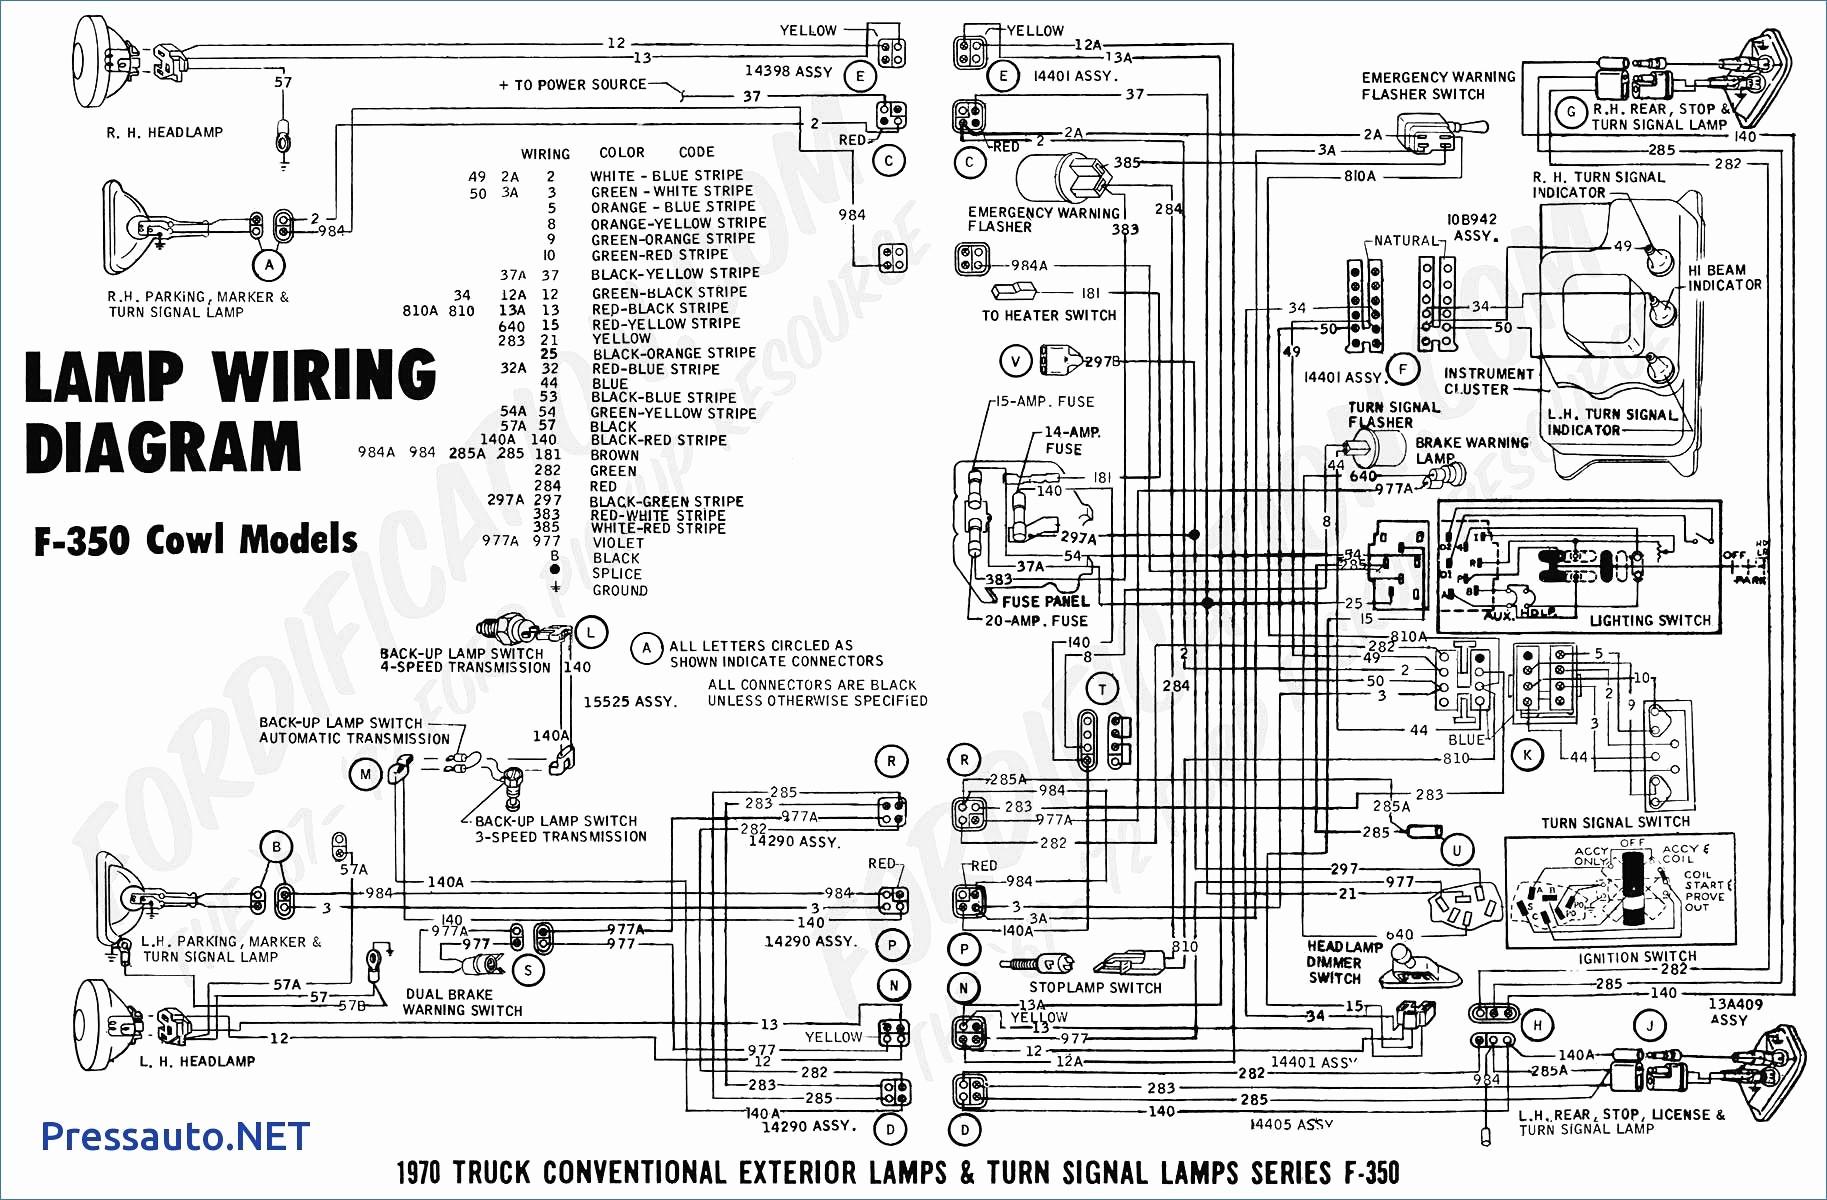 Spartan Motorhome Chis Wiring Diagram - Free Download Sa Series Wiring  Diagram - 7gen-nissaan.losdol2-lanjut.jeanjaures37.fr | Spartan Chassis Motorhome Wiring Diagrams |  | Wiring Diagram Resource